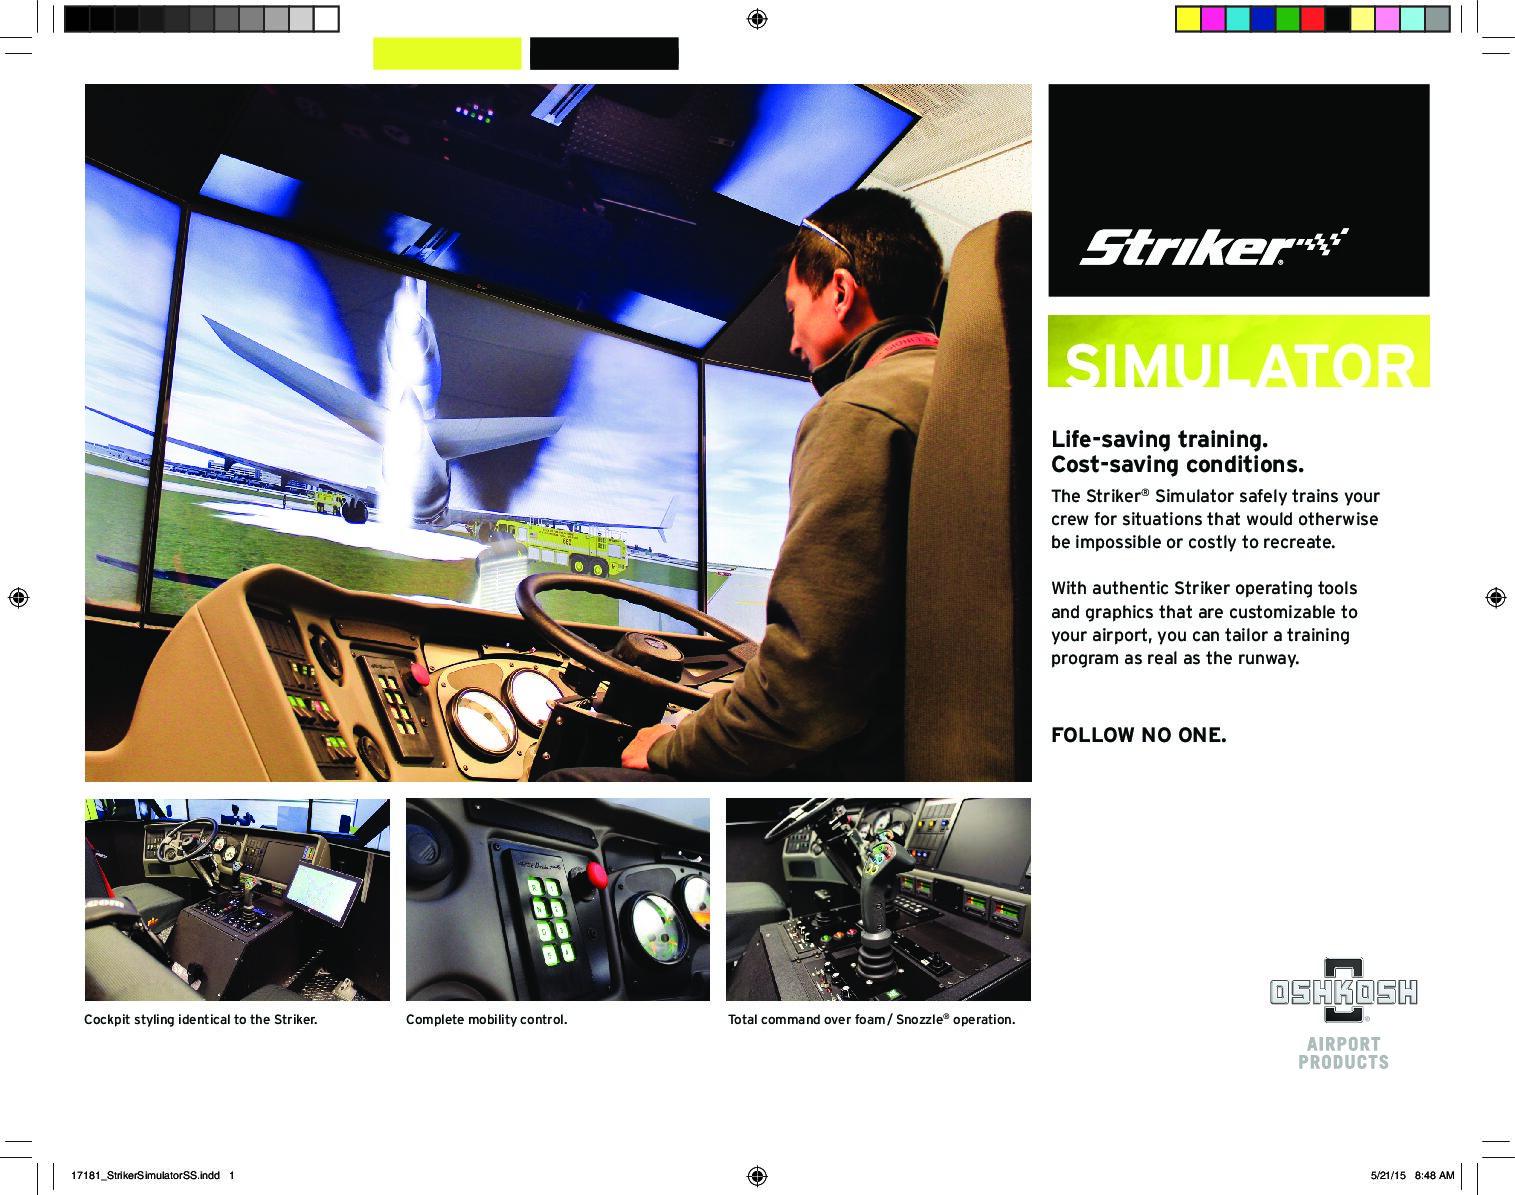 Striker Simulator